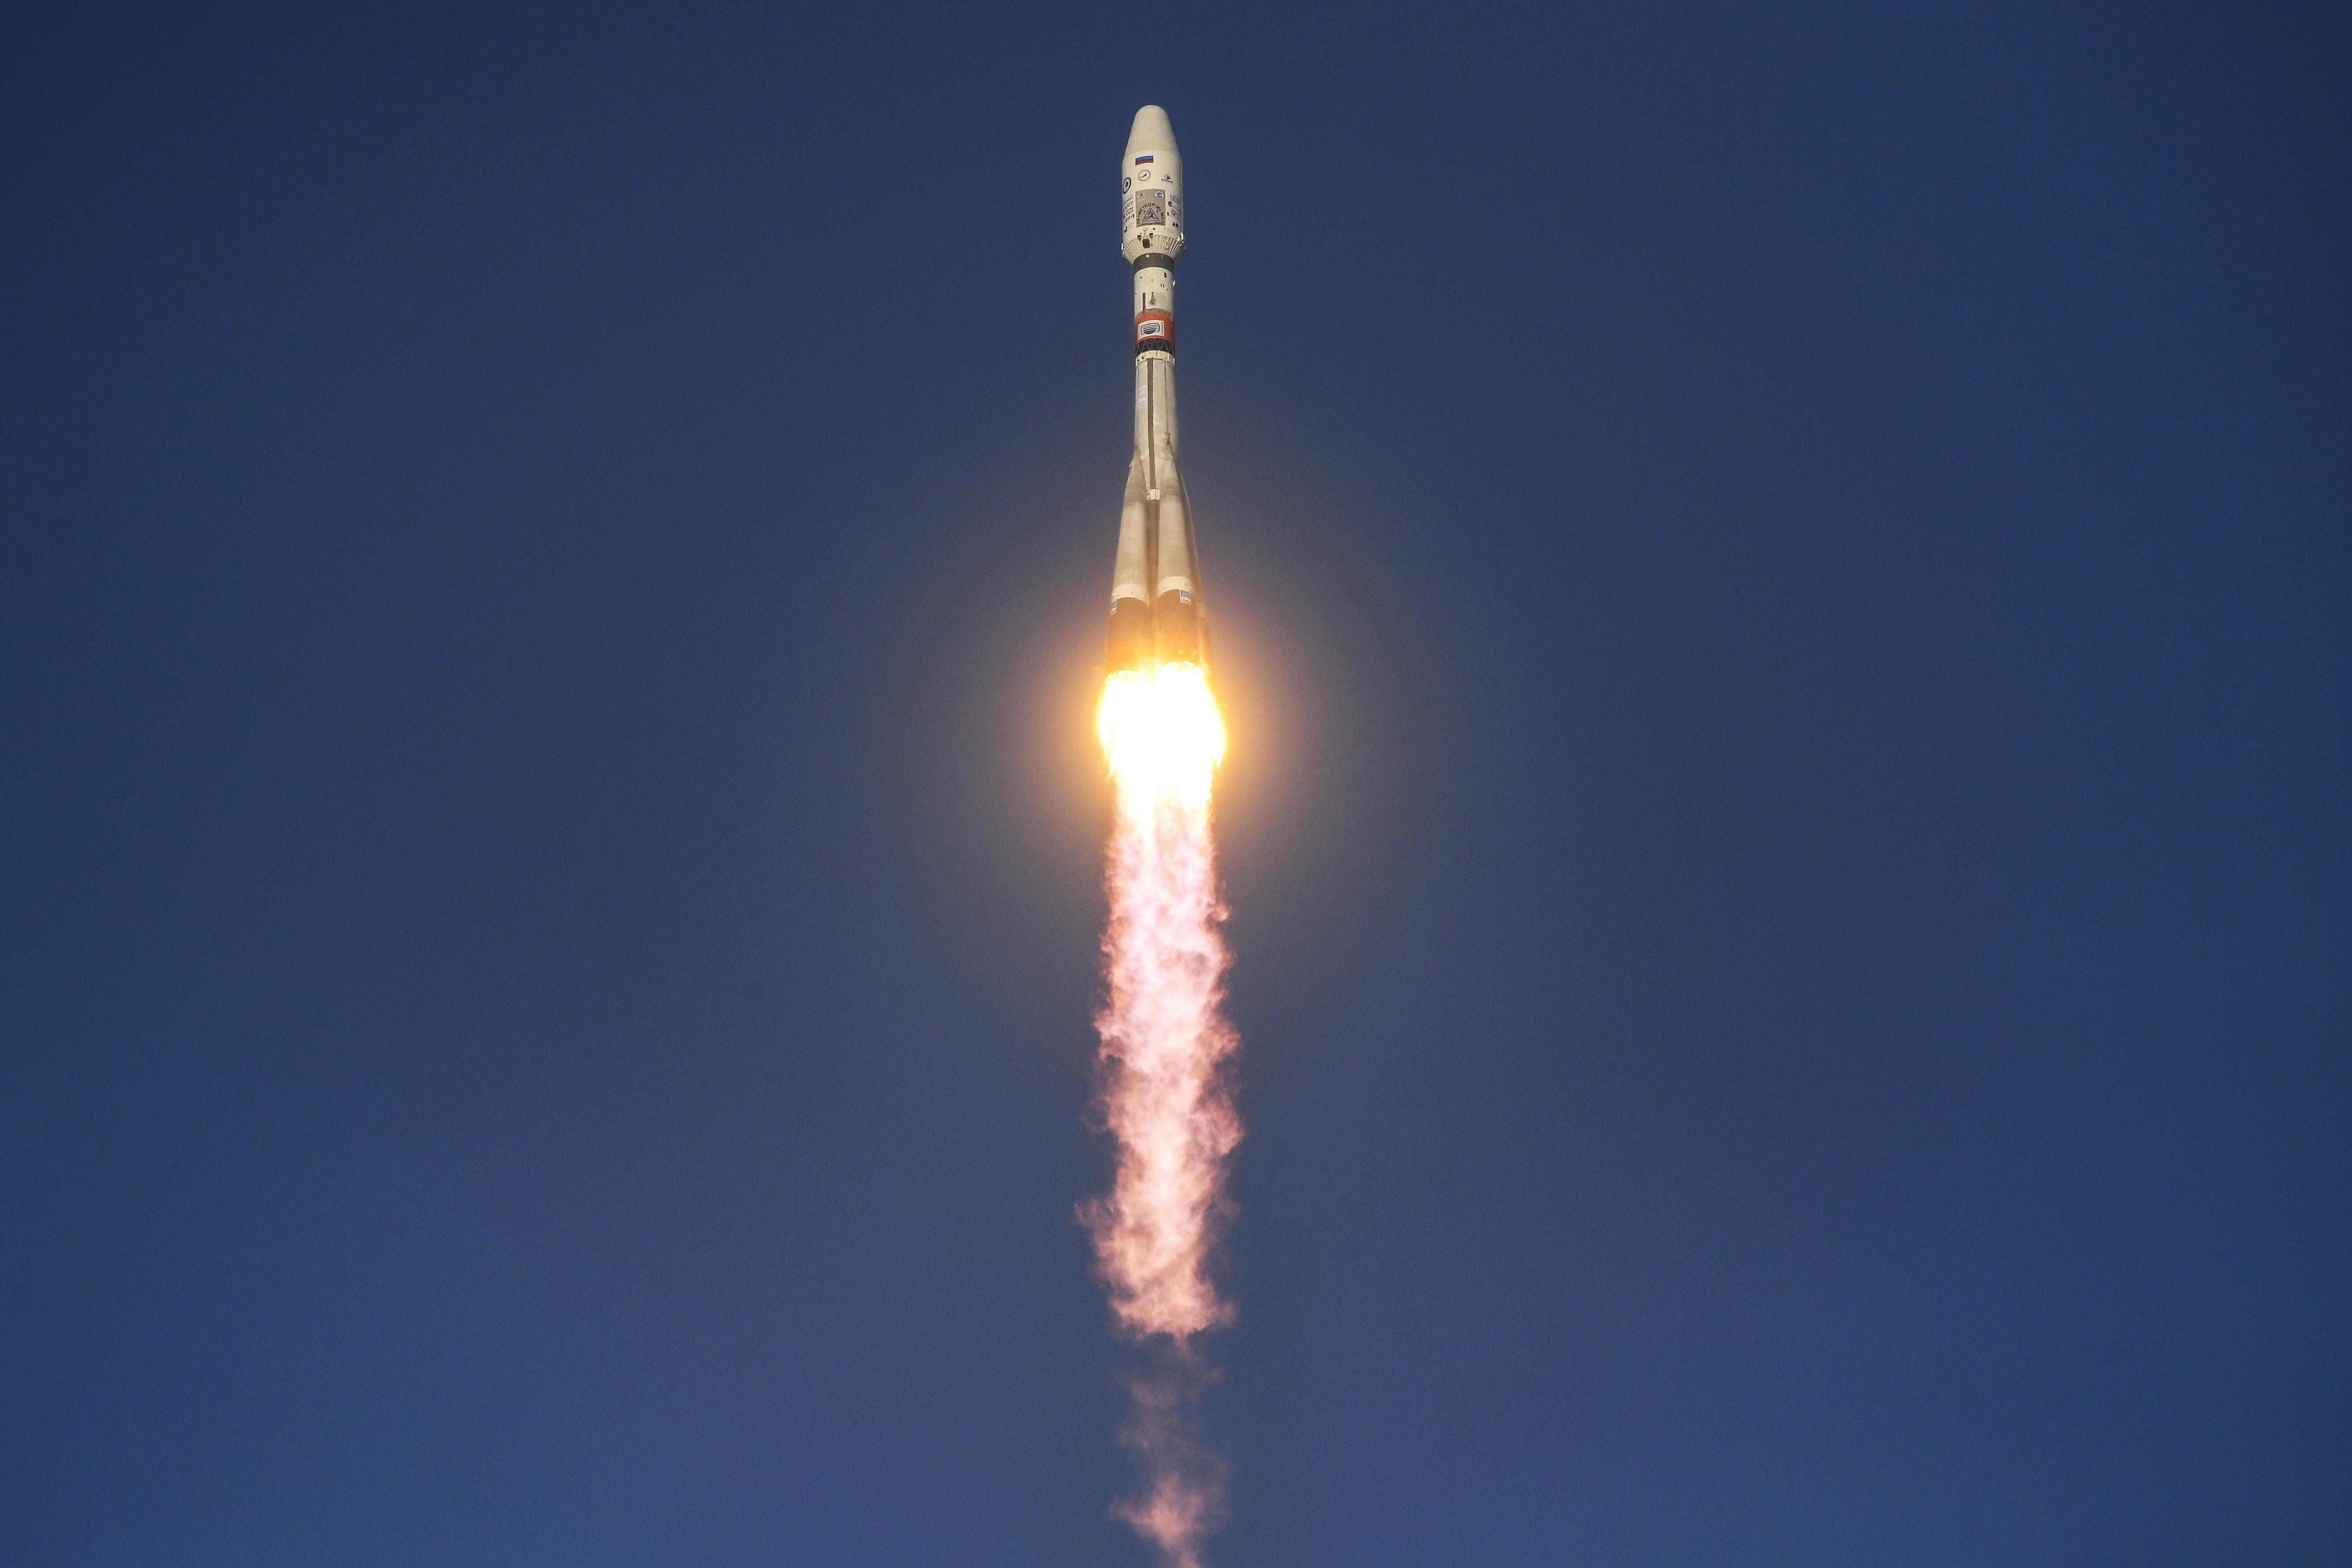 <p>Фото: &copy; РИА Новости/Рамиль Ситдиков</p>